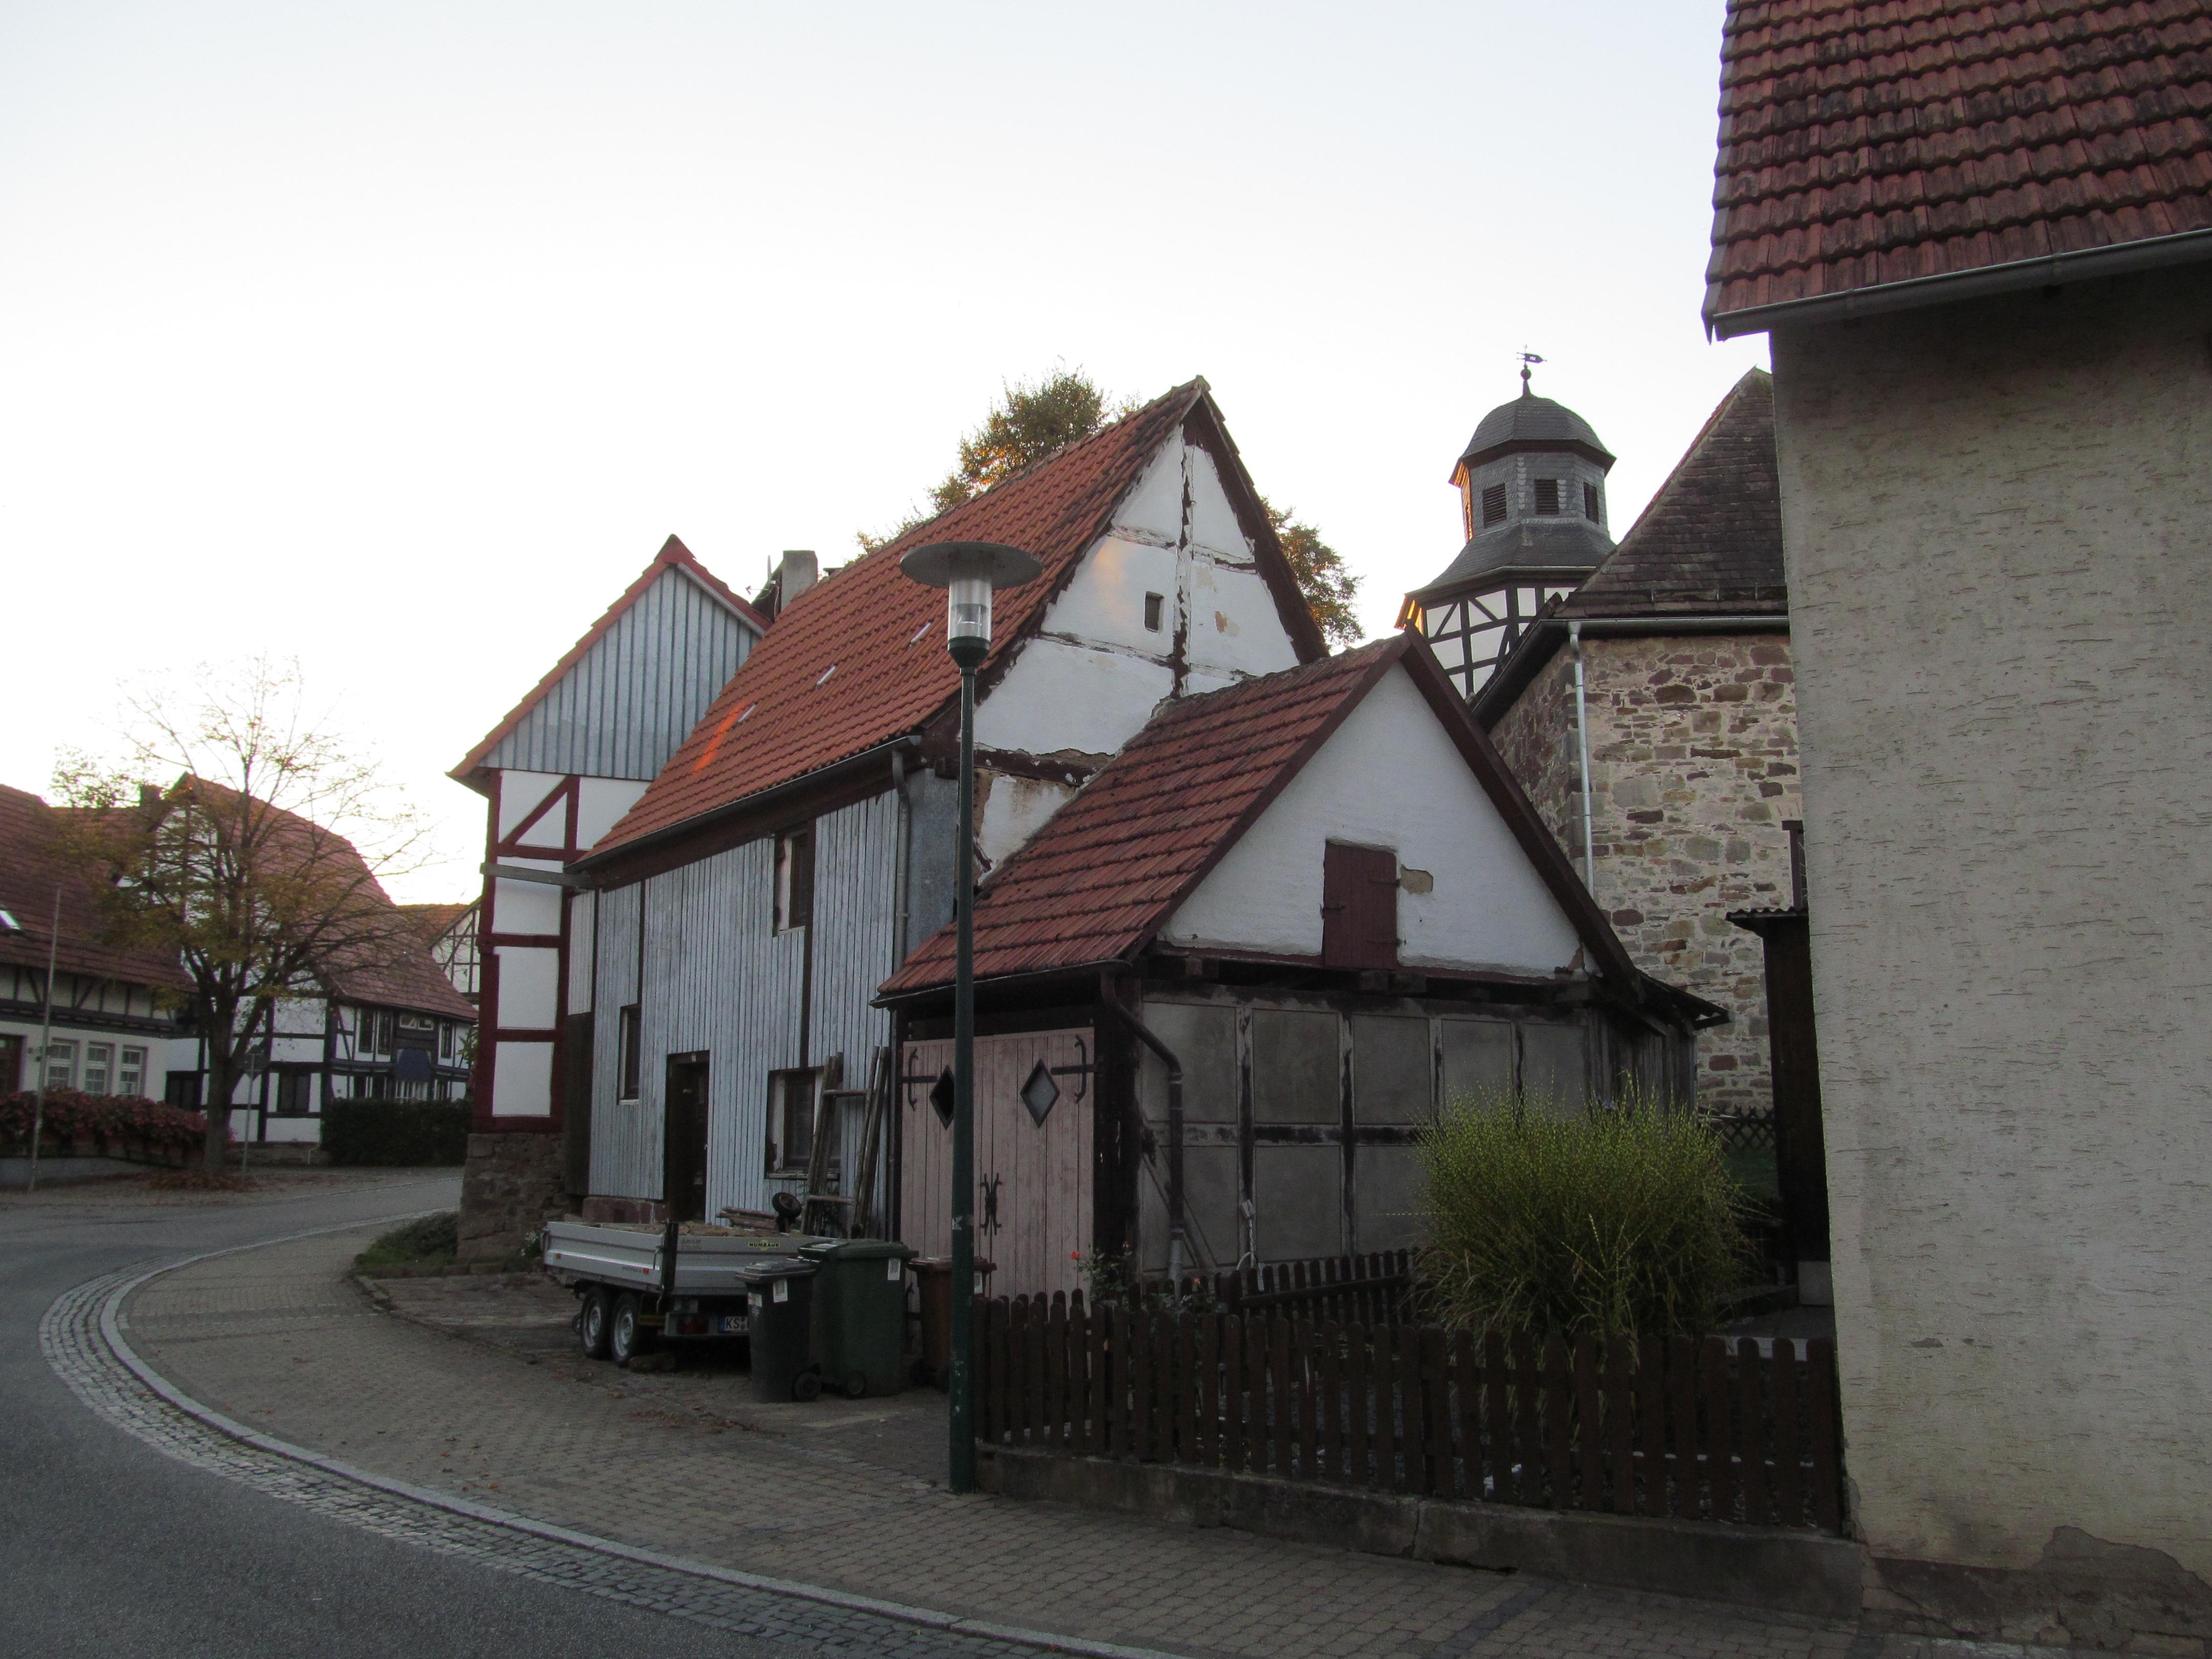 File:Hauptstraße 71, 2, Hümme, Hofgeismar, Landkreis Kassel